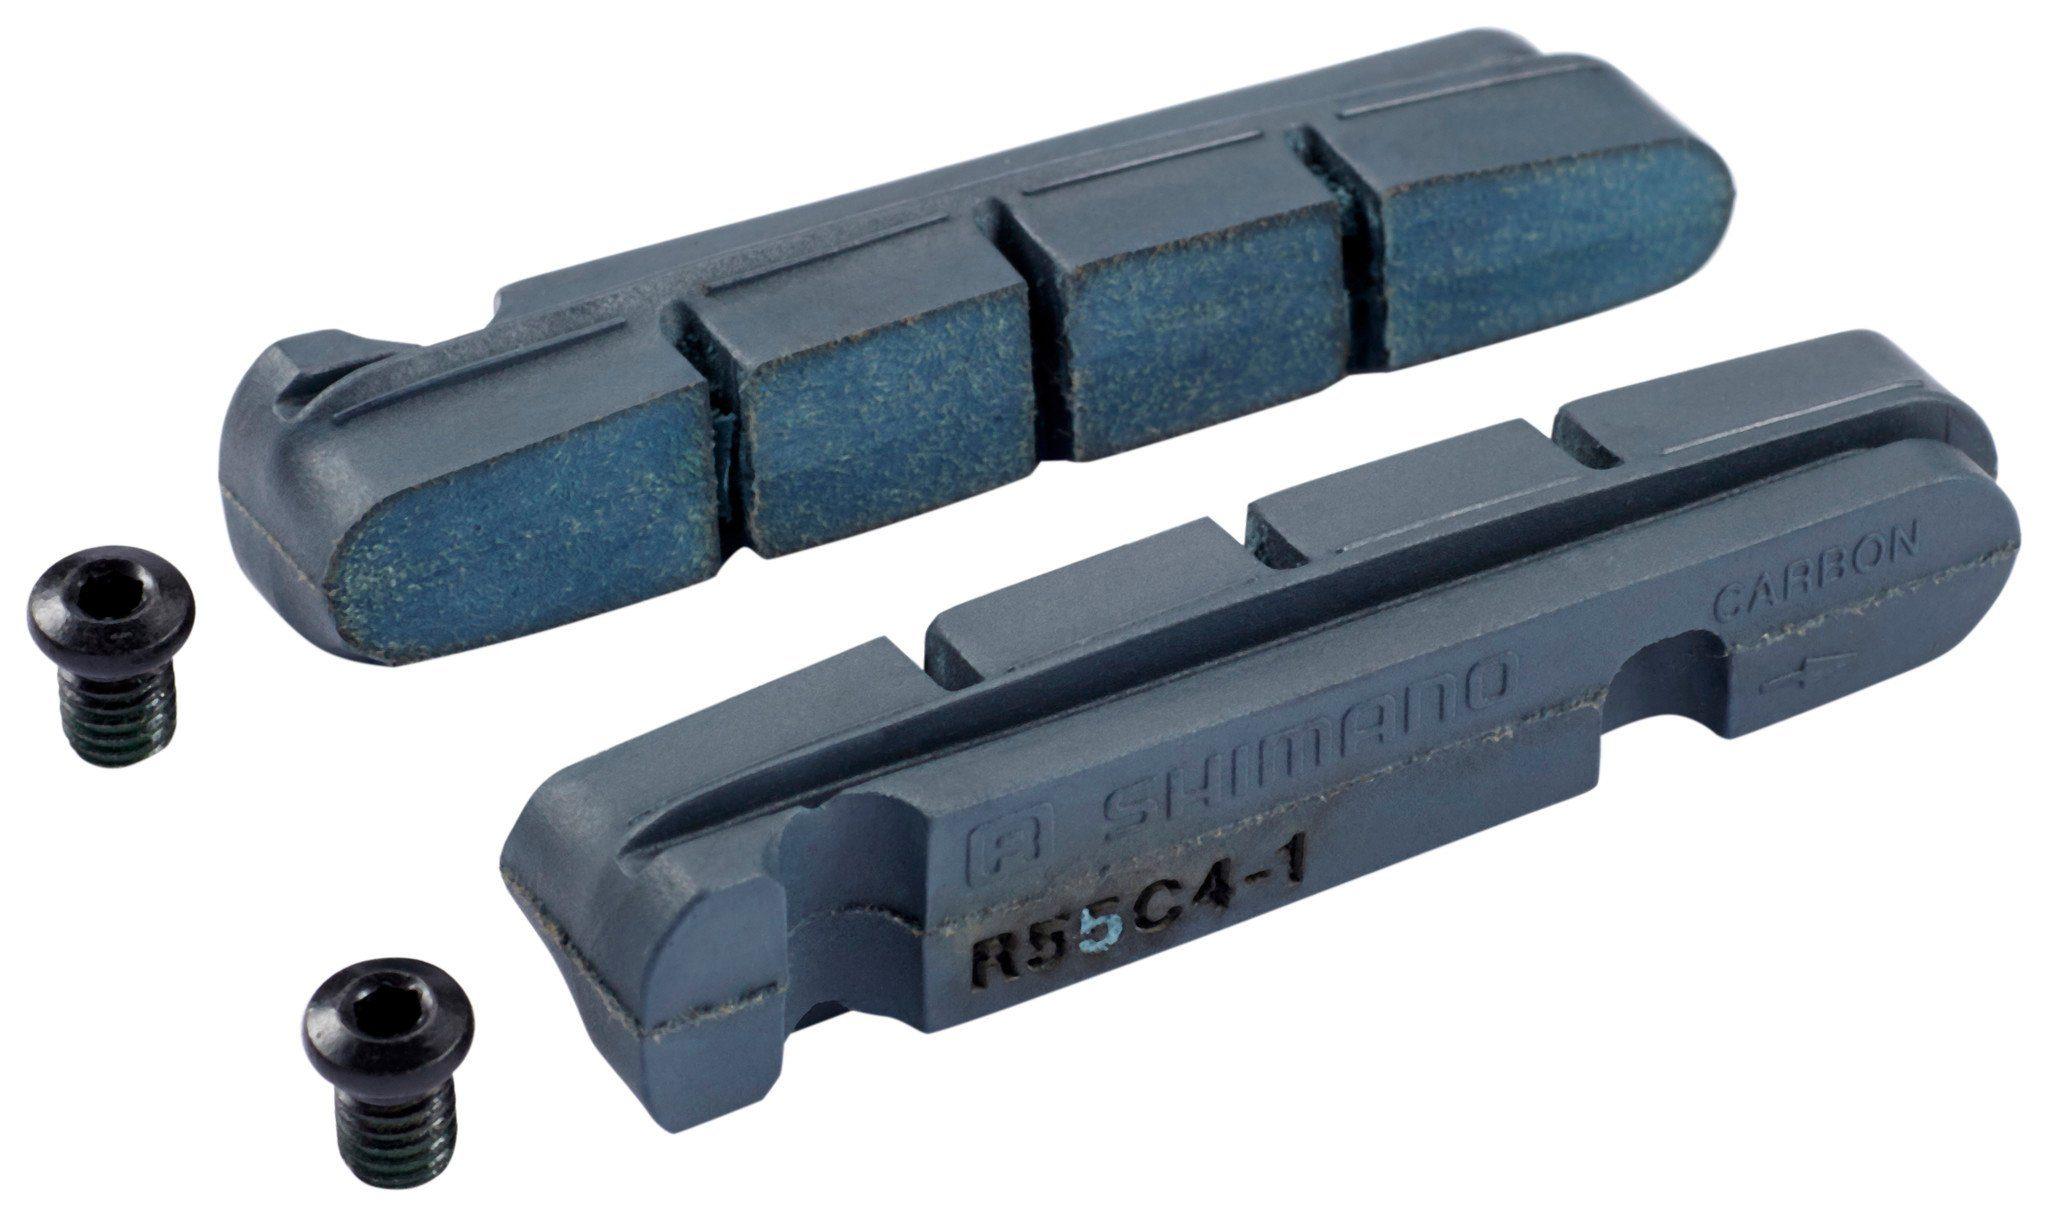 Shimano Bremsbelag »R55C4-1 Cartridge Bremsschuhe für Carbon Felgen«